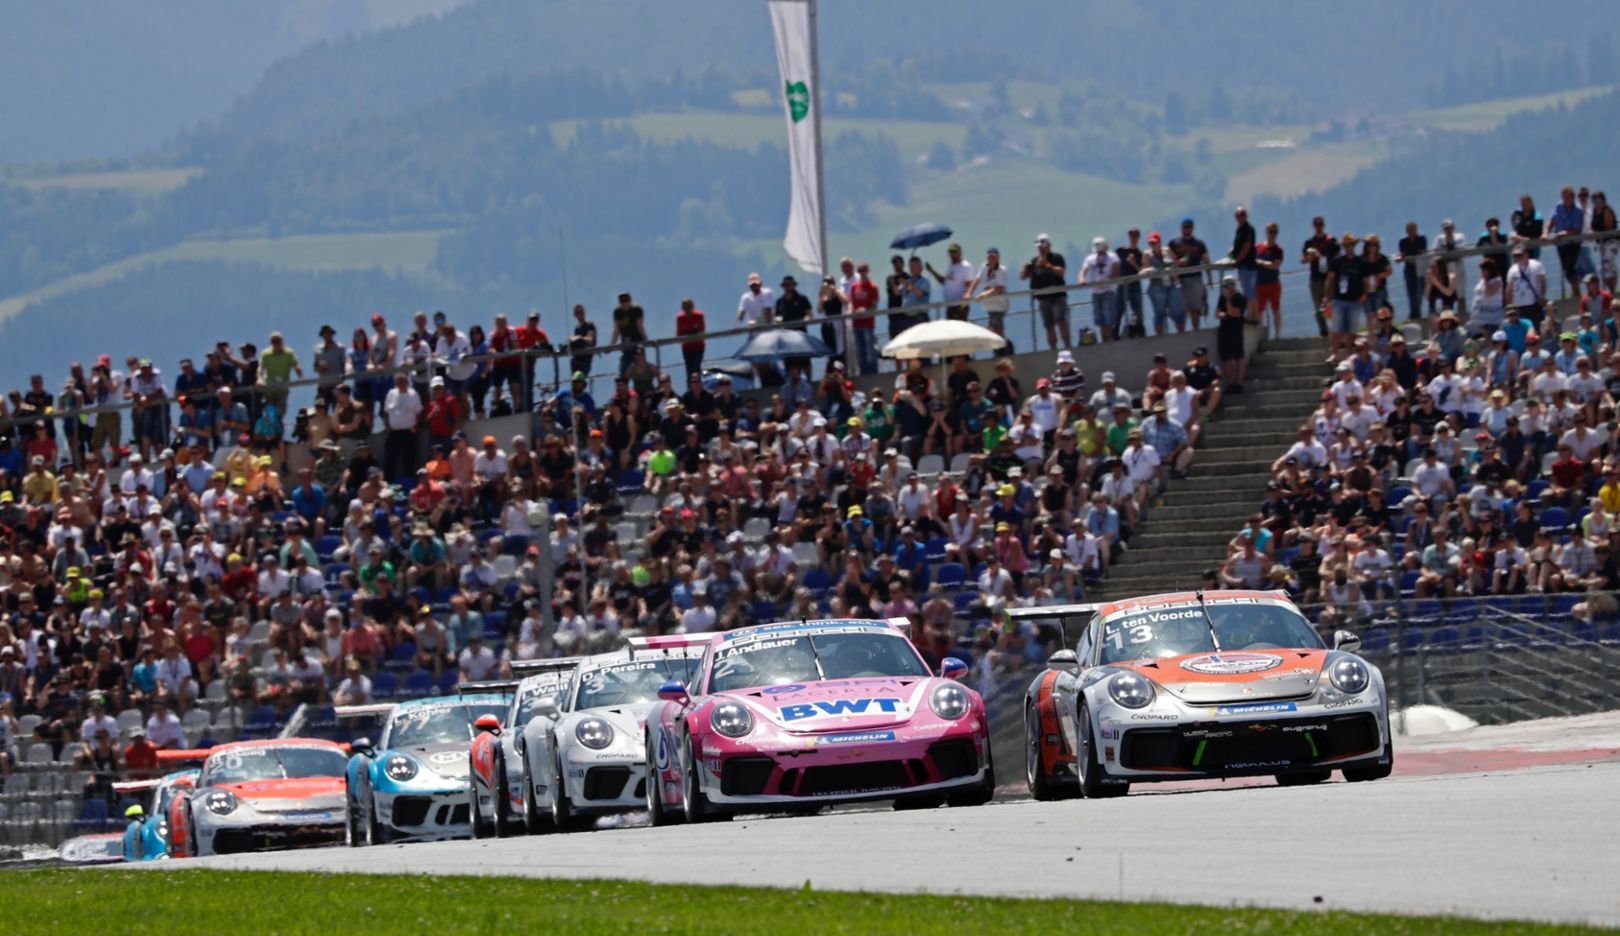 Porsche 911 GT3 Cup, Porsche Carrera Cup Deutschland, Spielberg, Austria, Race 6, 2019, Porsche AG